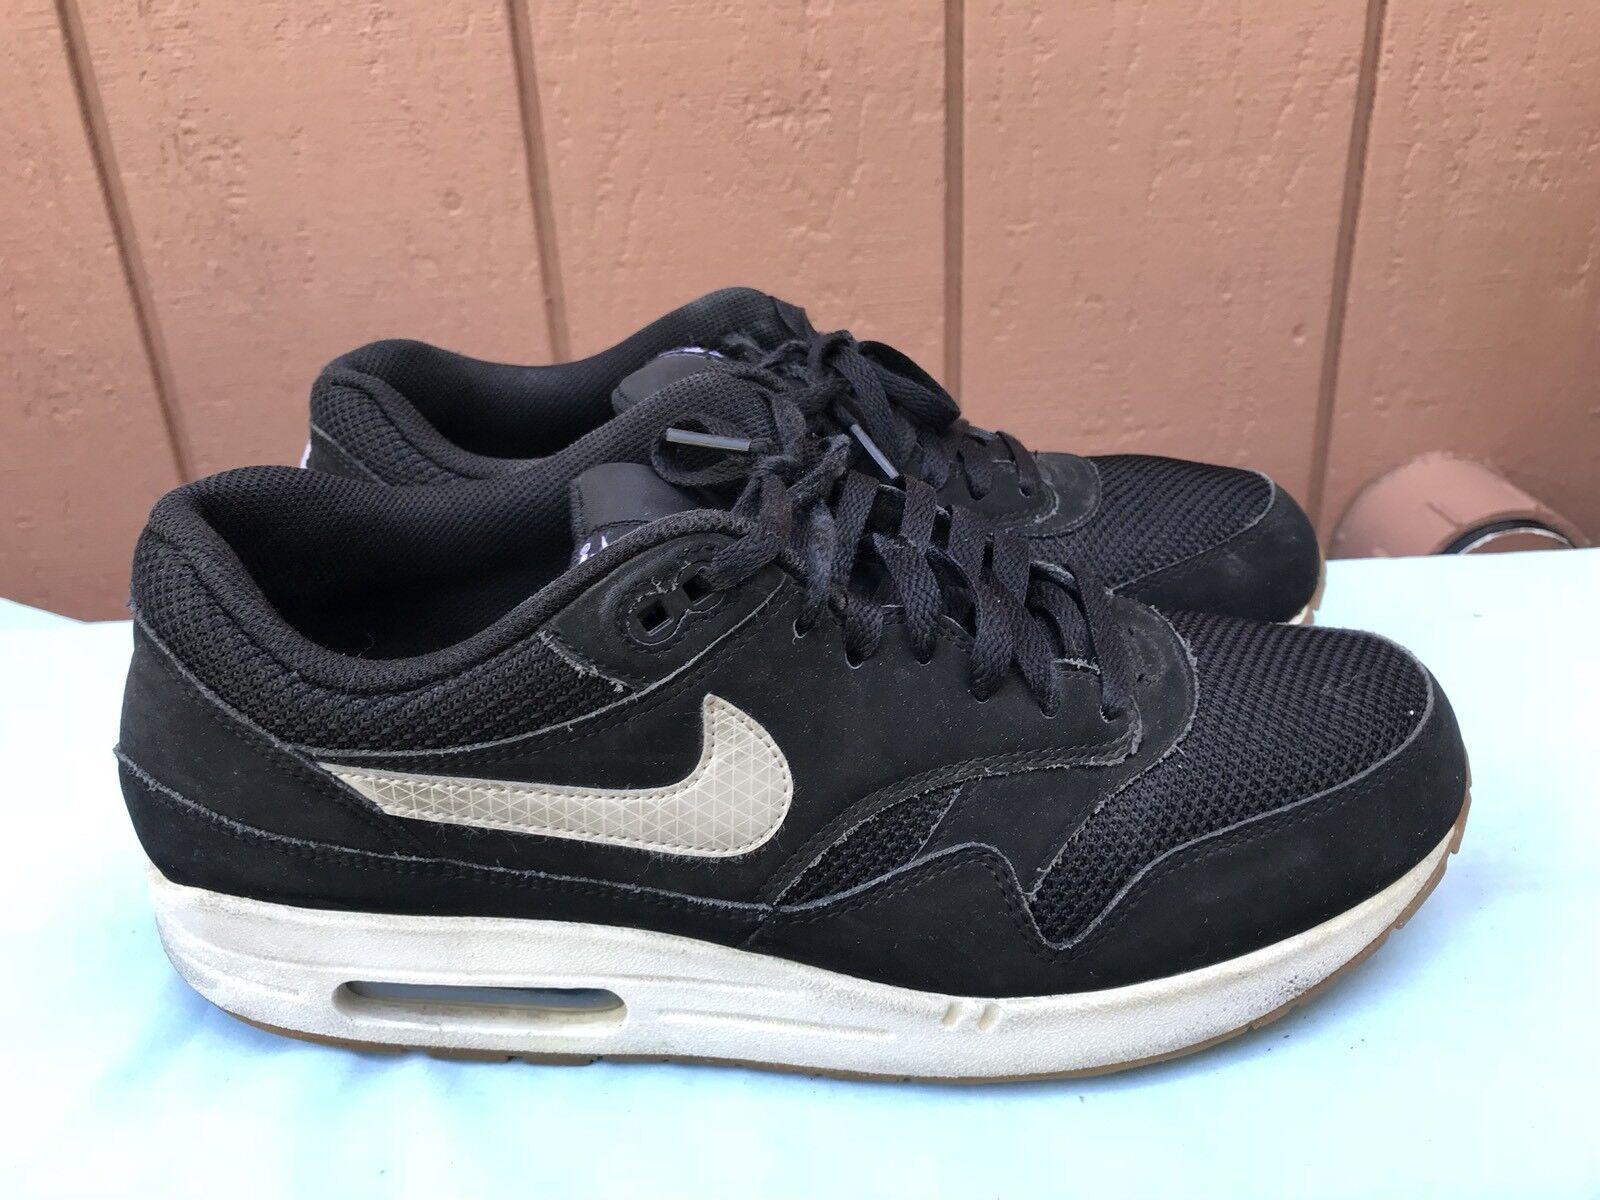 online store 6a0bc abe4c Nike Hombre Hombre Hombre Air Max 1 Essential US 11 537383 026 Negro    light color